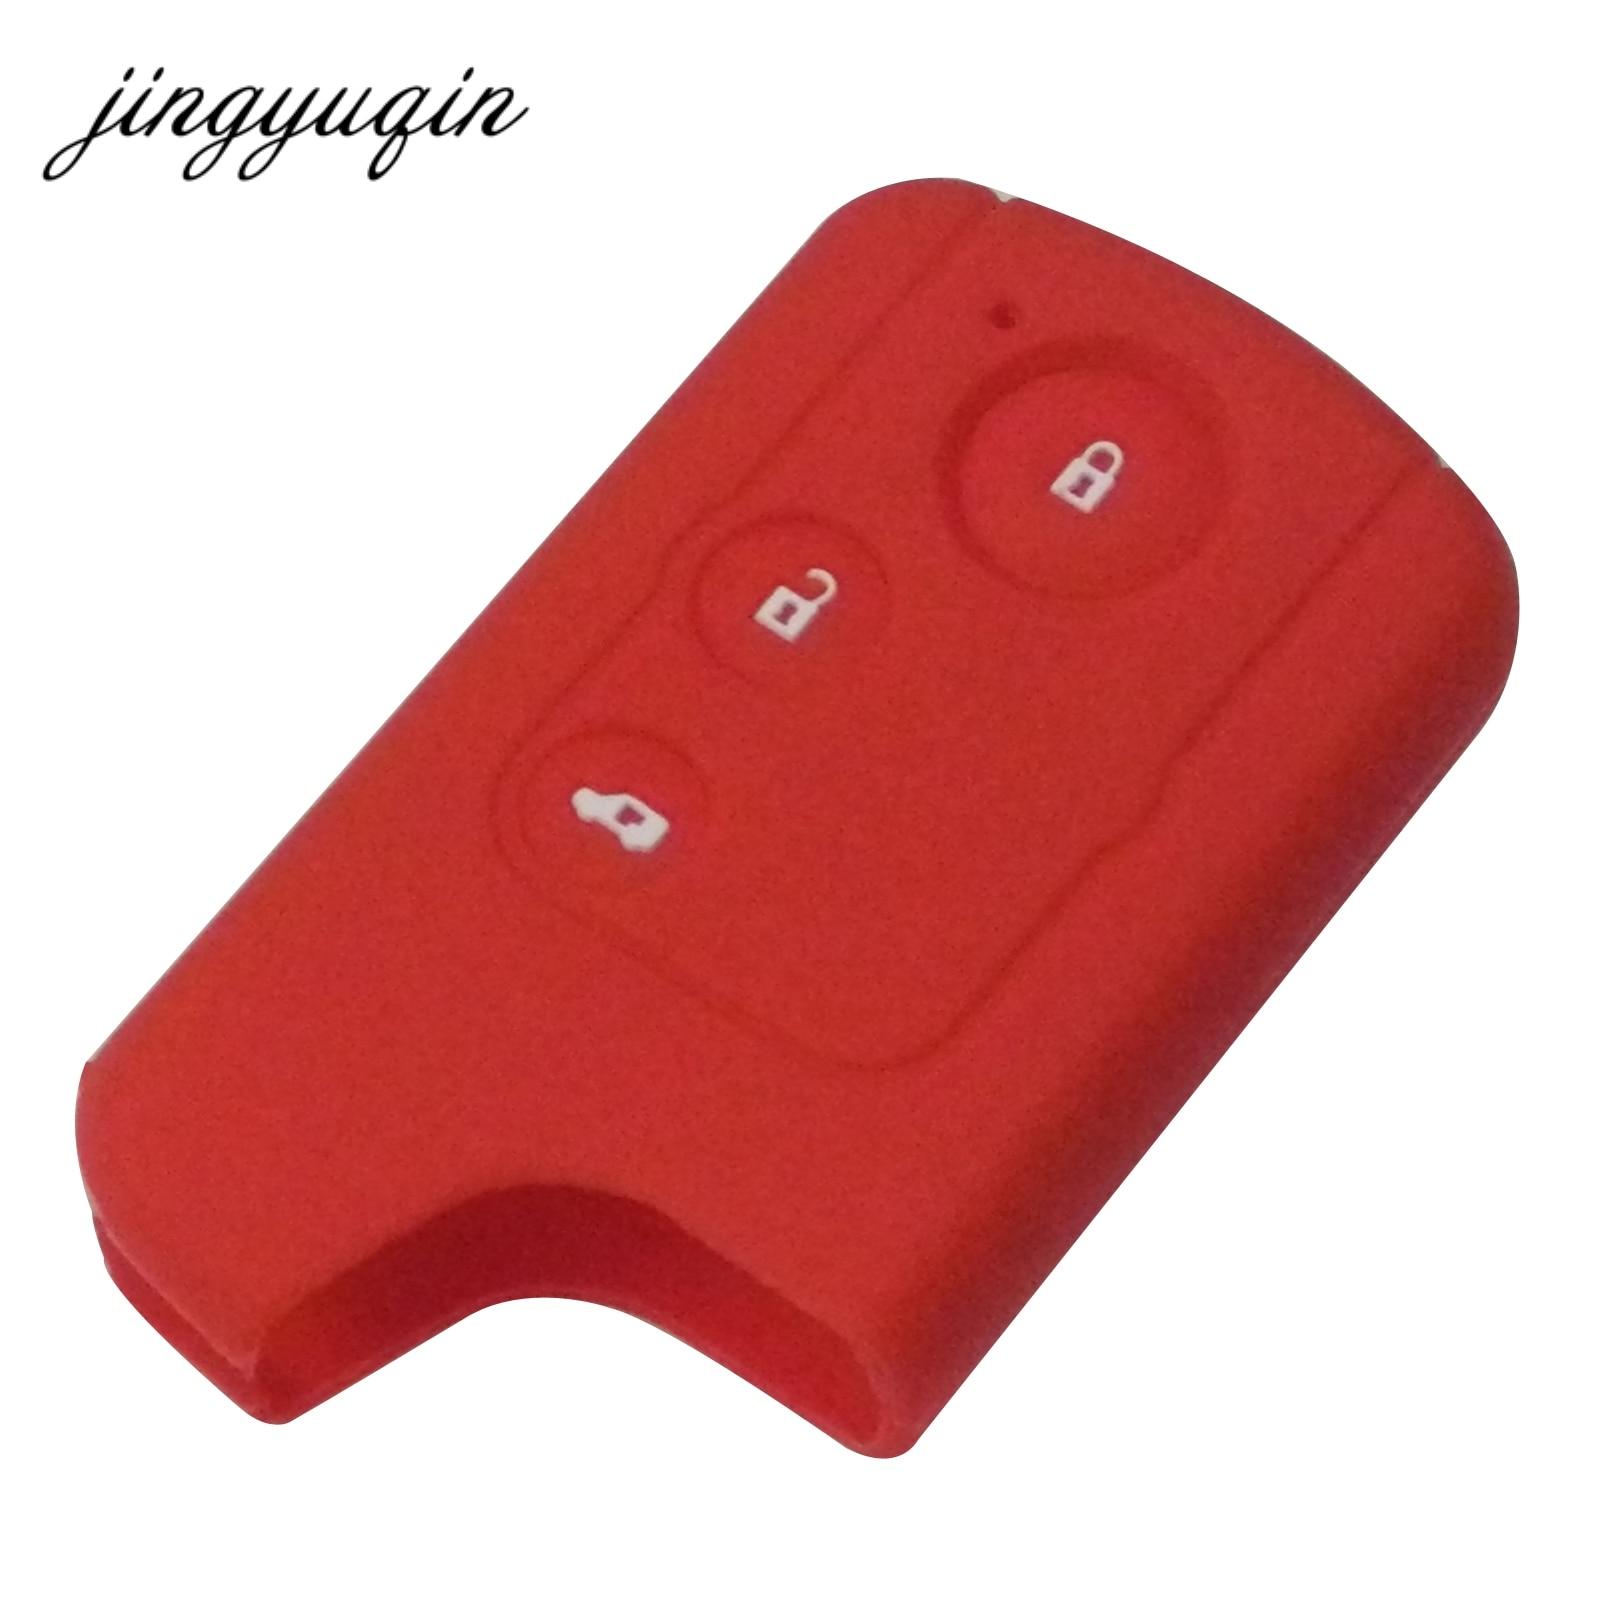 jingyuqin Silicone key Case Cover for Honda Civic Remote Smart Case Protective Holder